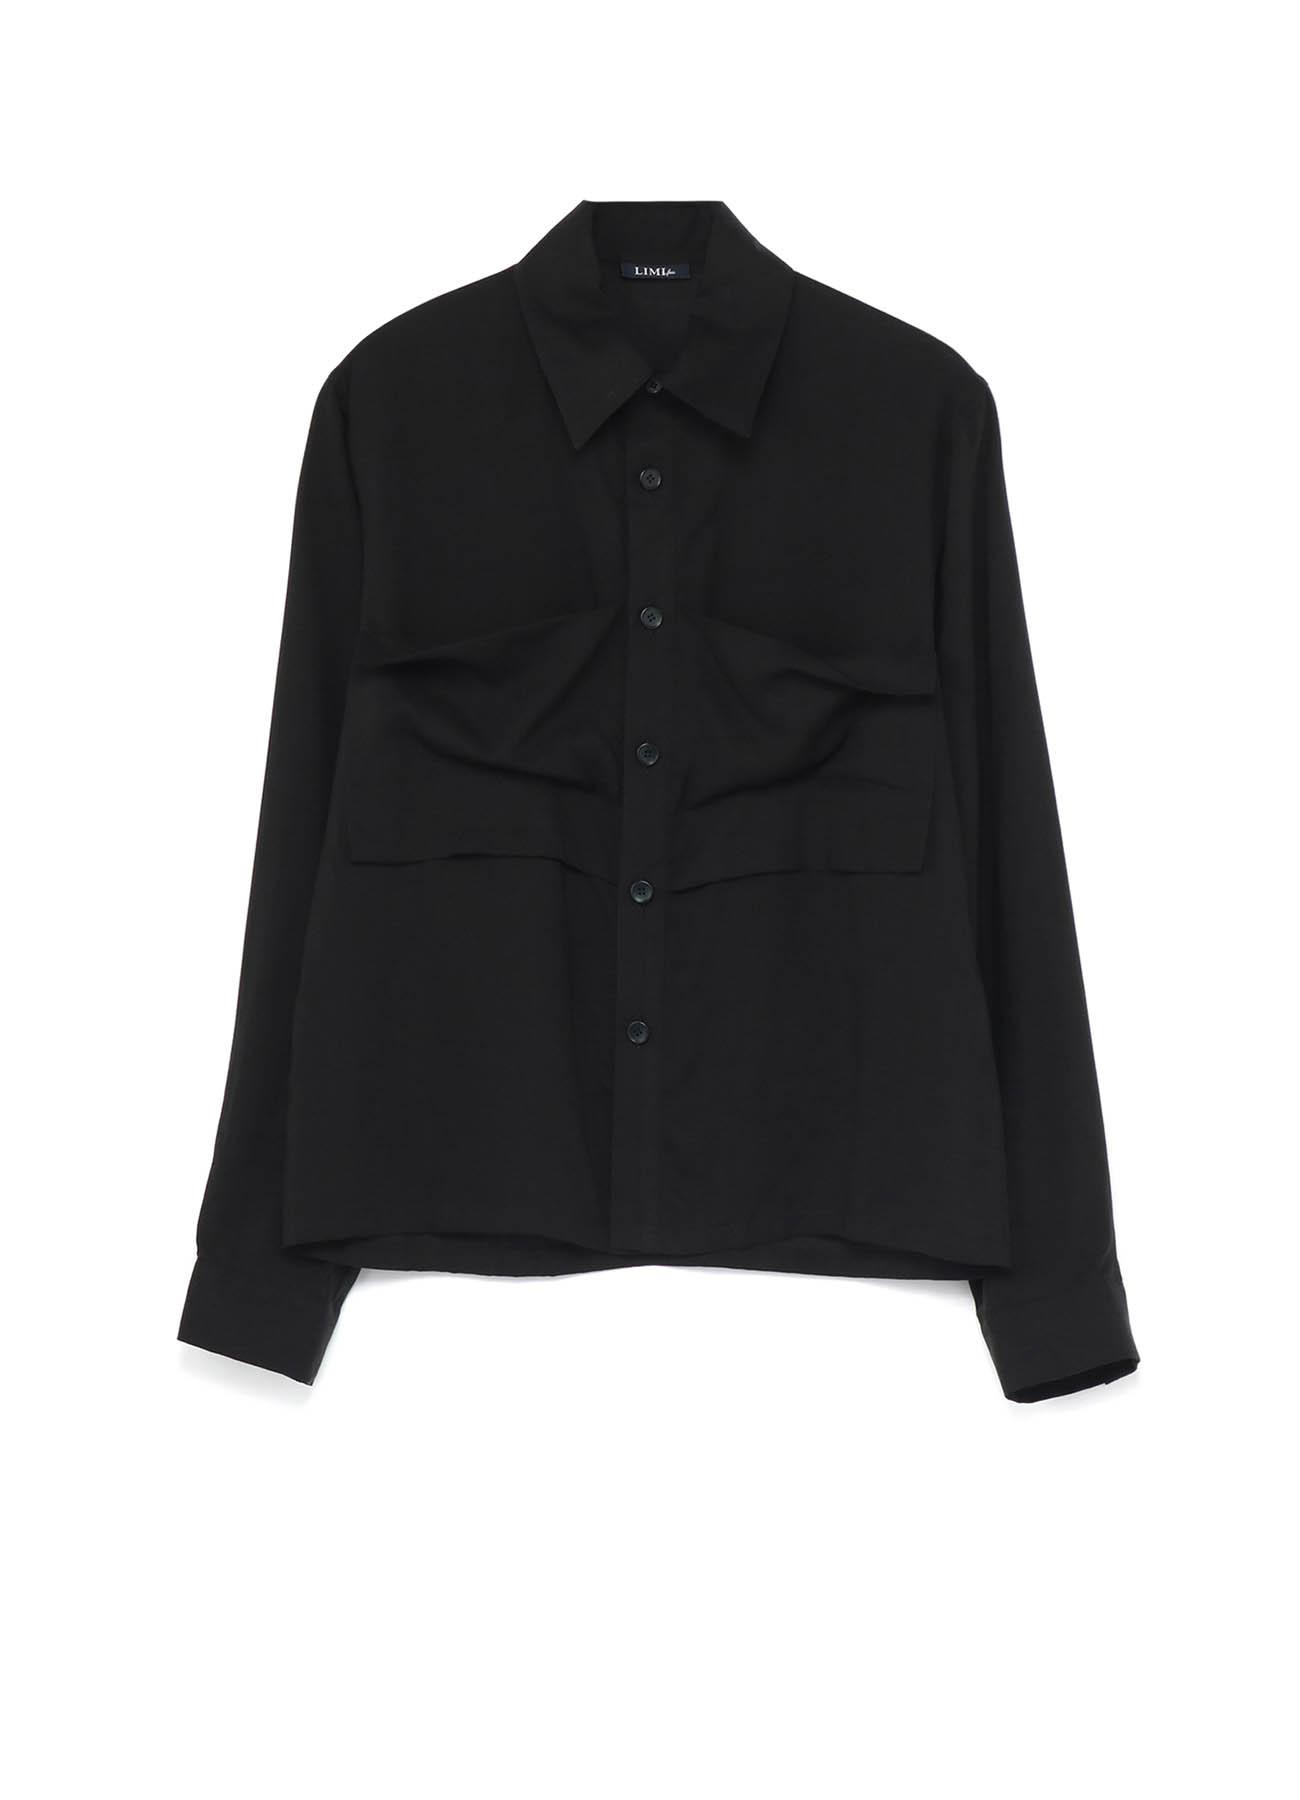 Soft Lawn Square Pocket Shirt